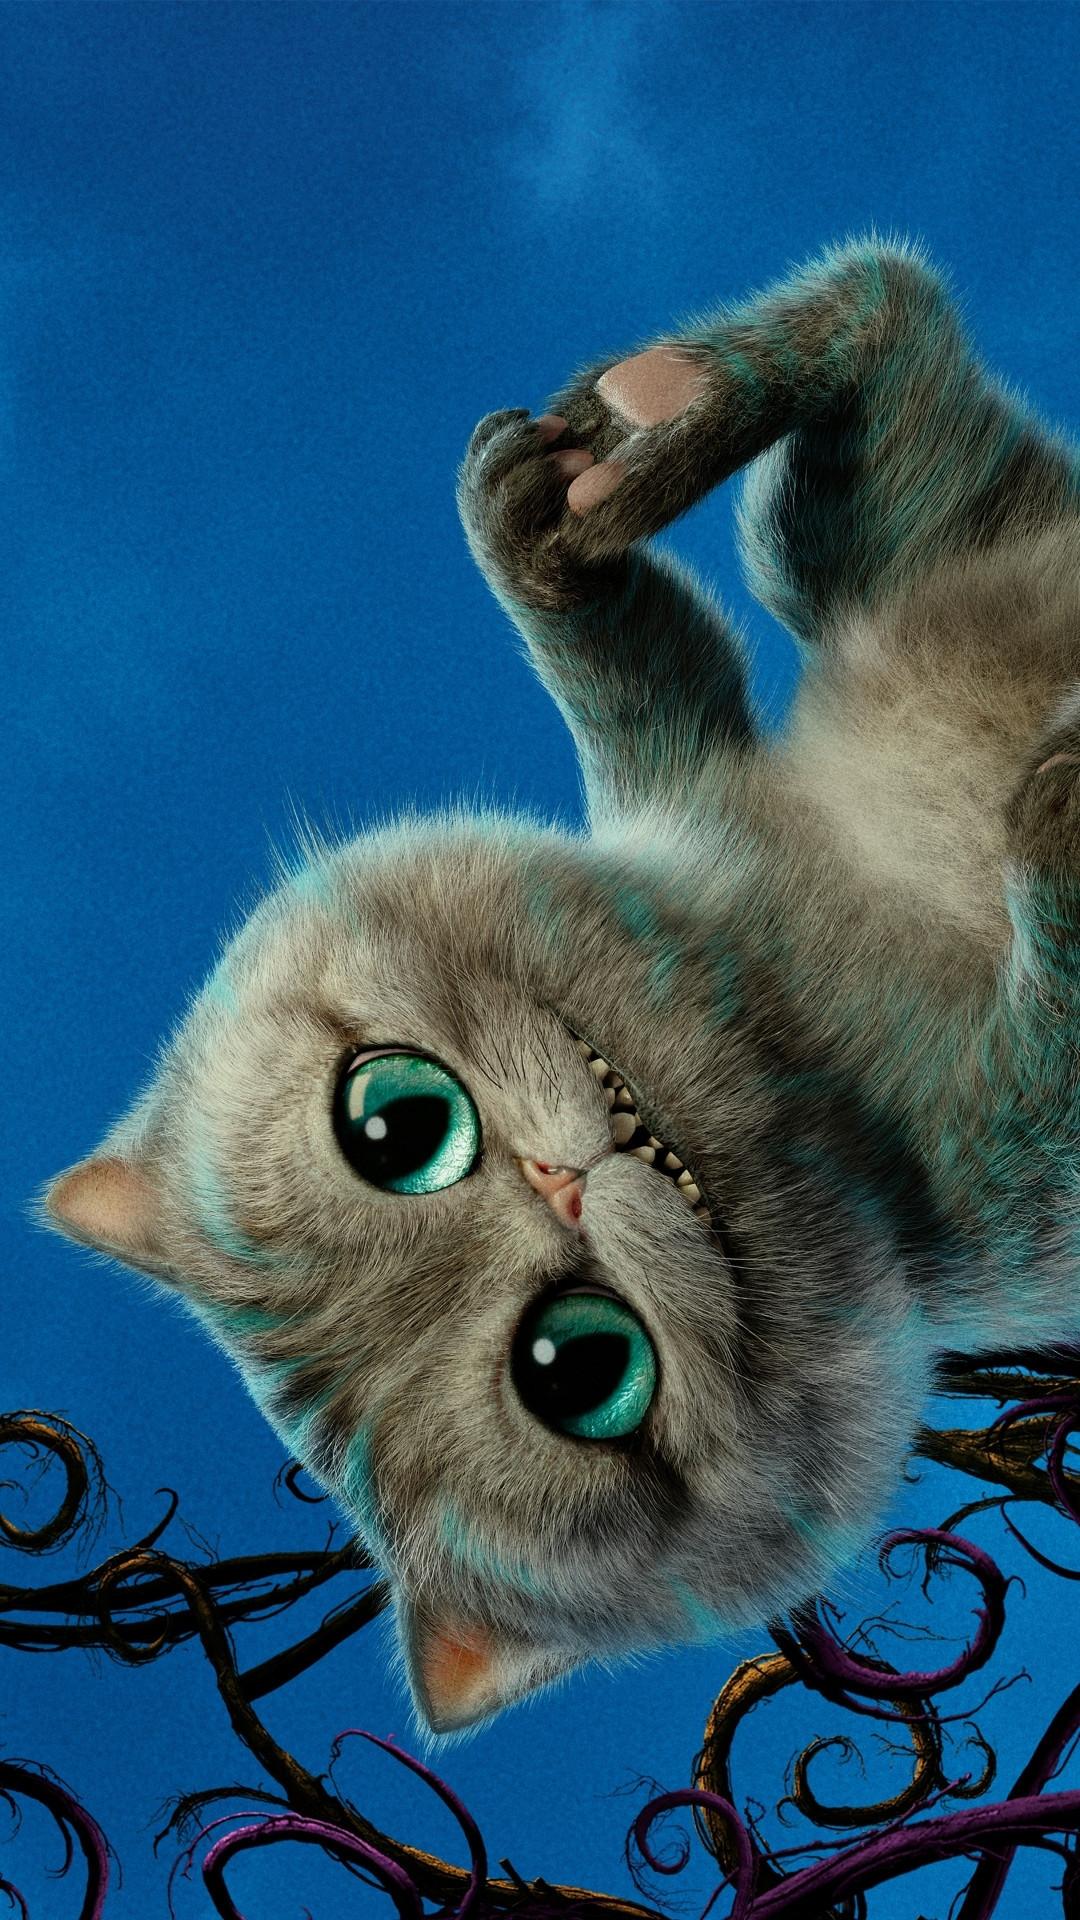 Grumpy Cat Screensaver Www Tollebild Com